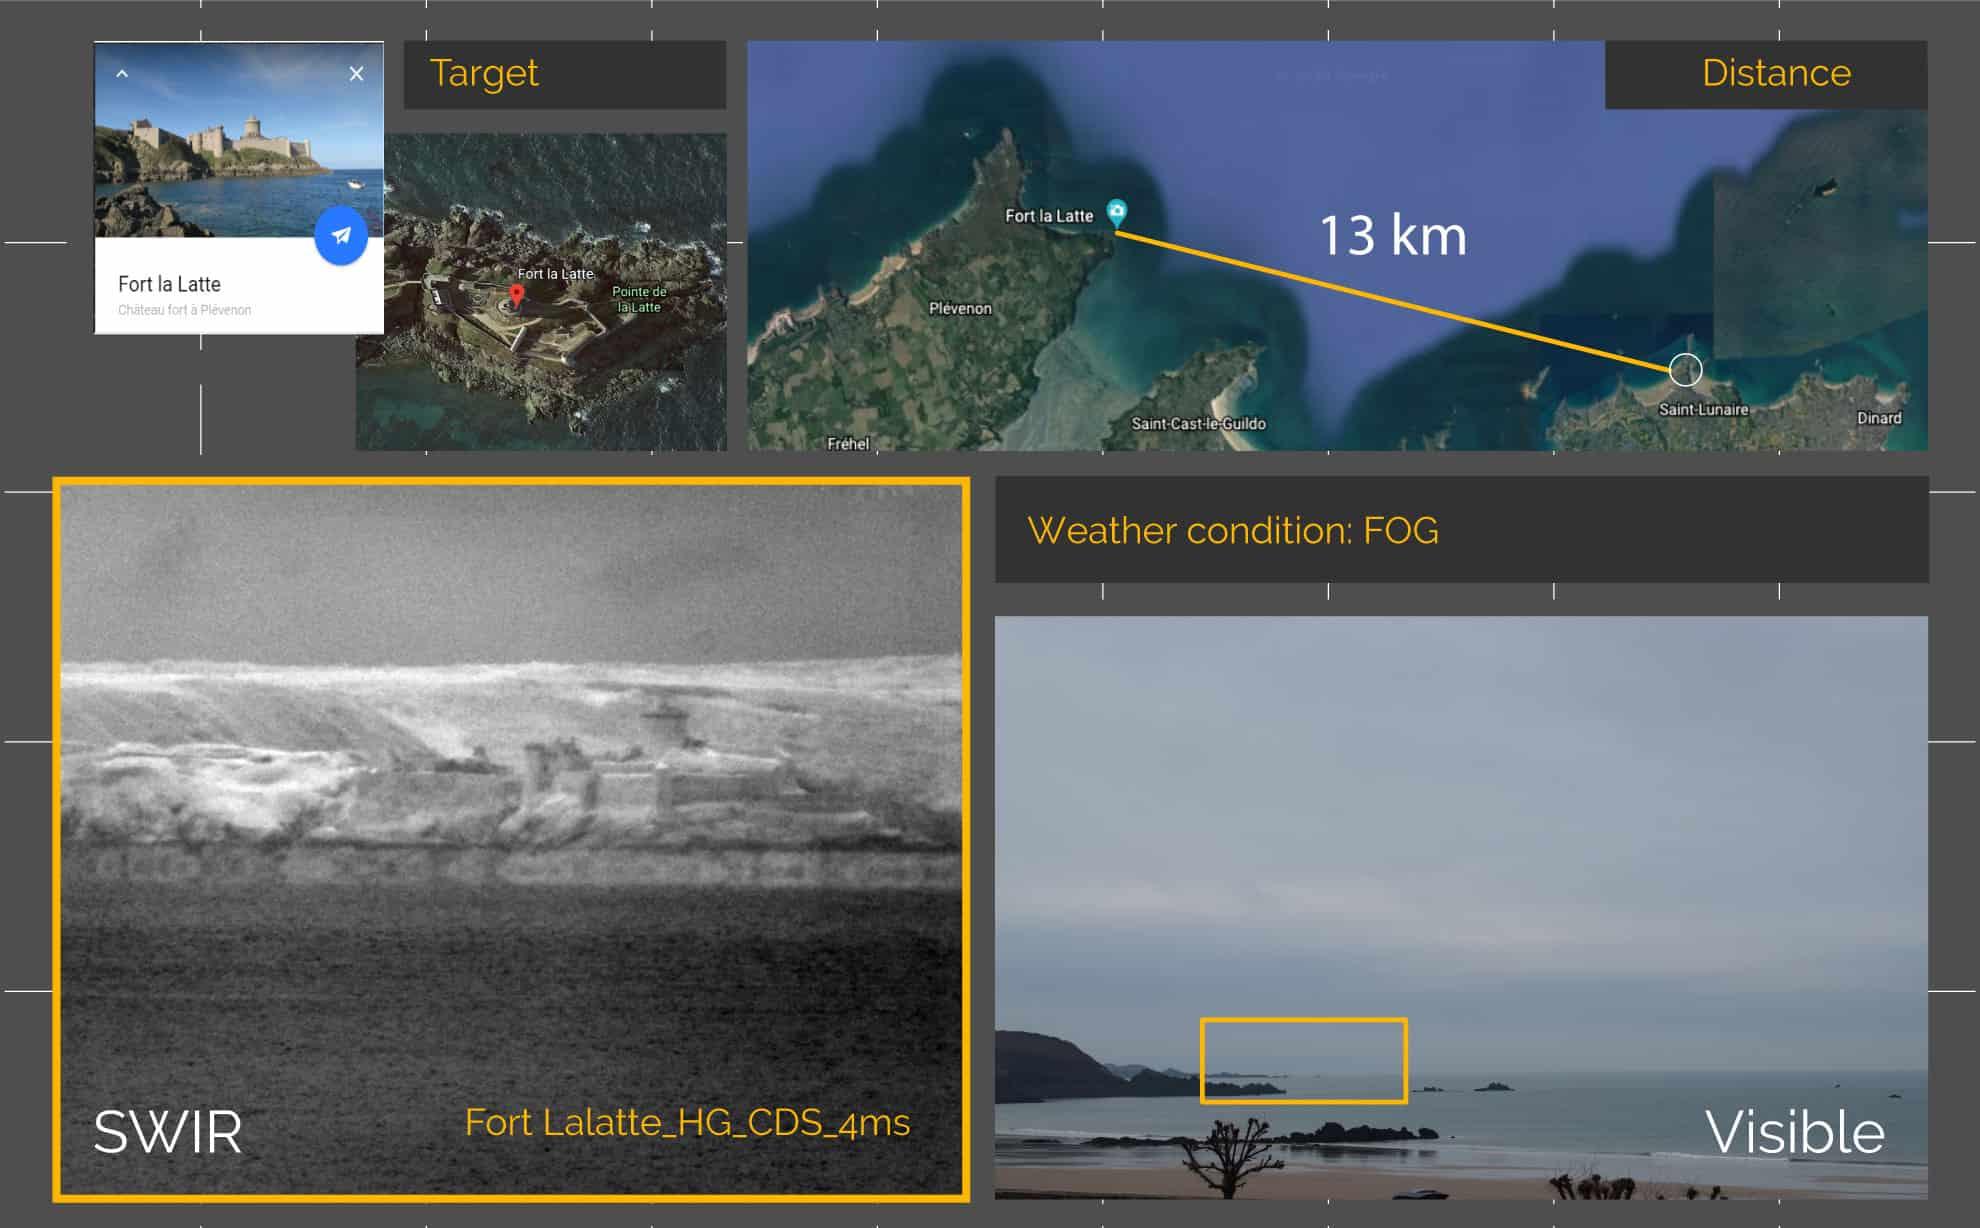 Fort la Latte observation with NIT SWIR camera